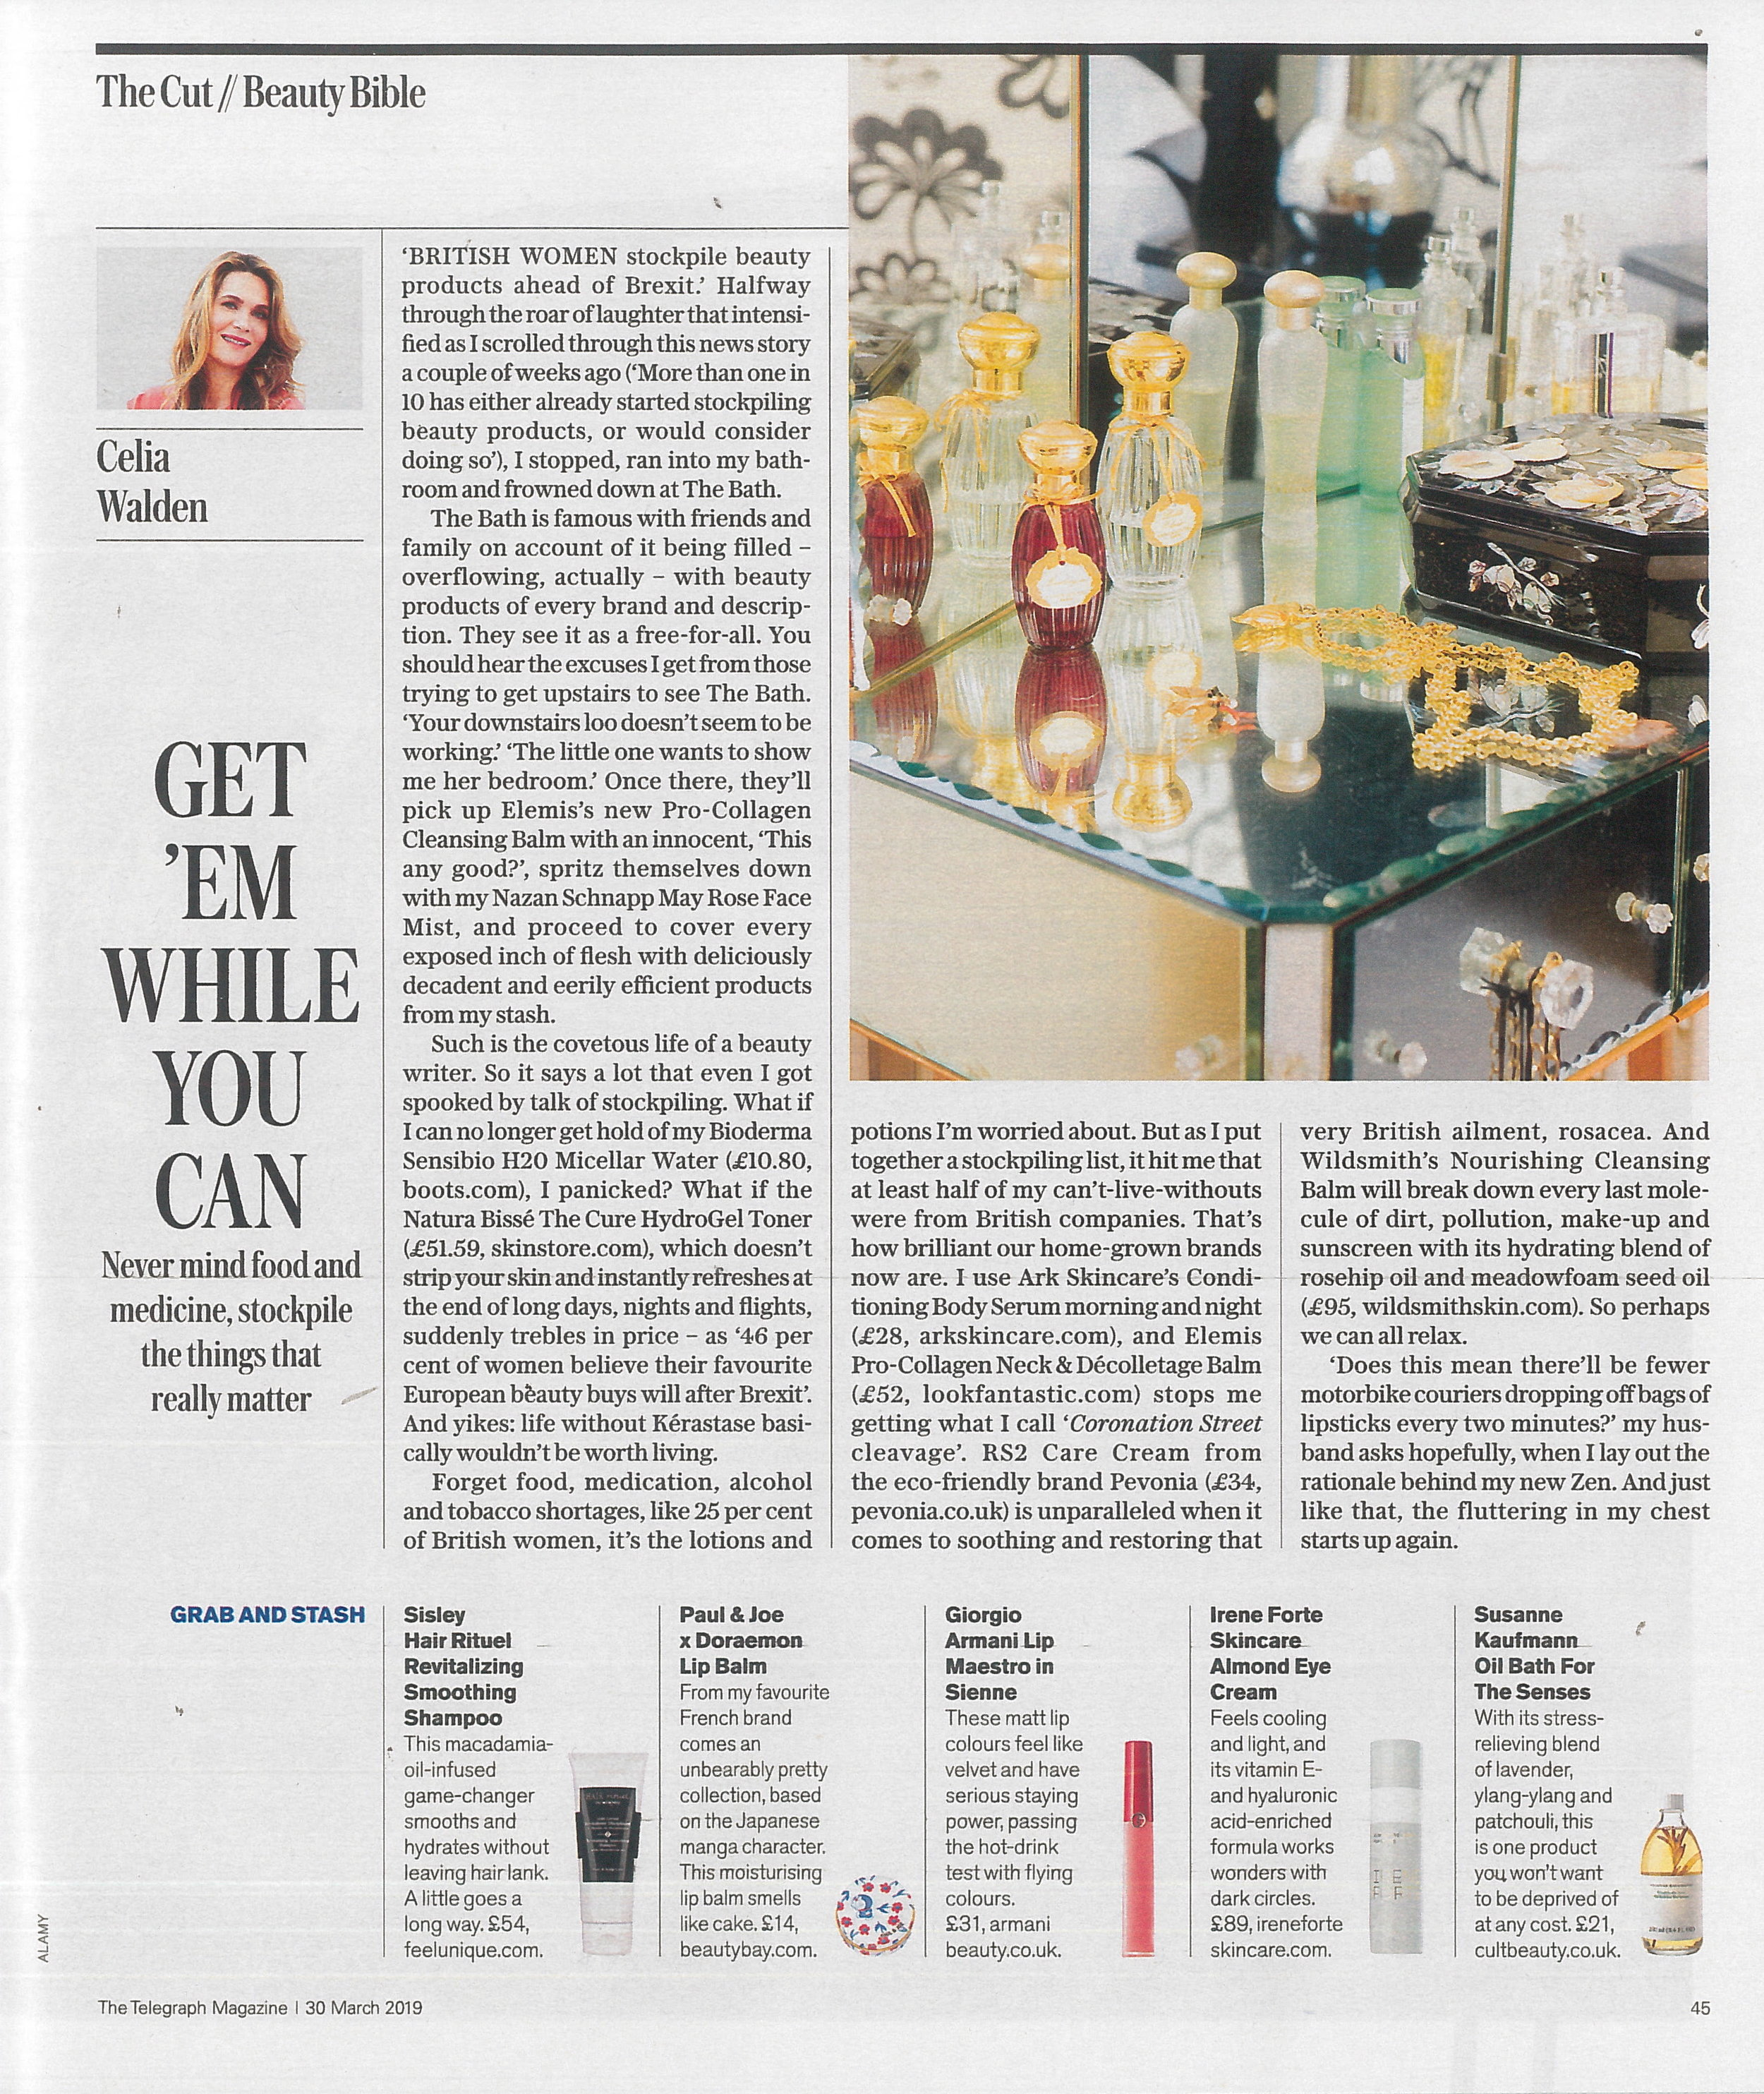 The Telegraph Magazine, 30th March (Almond Eye Cream), 1.jpg